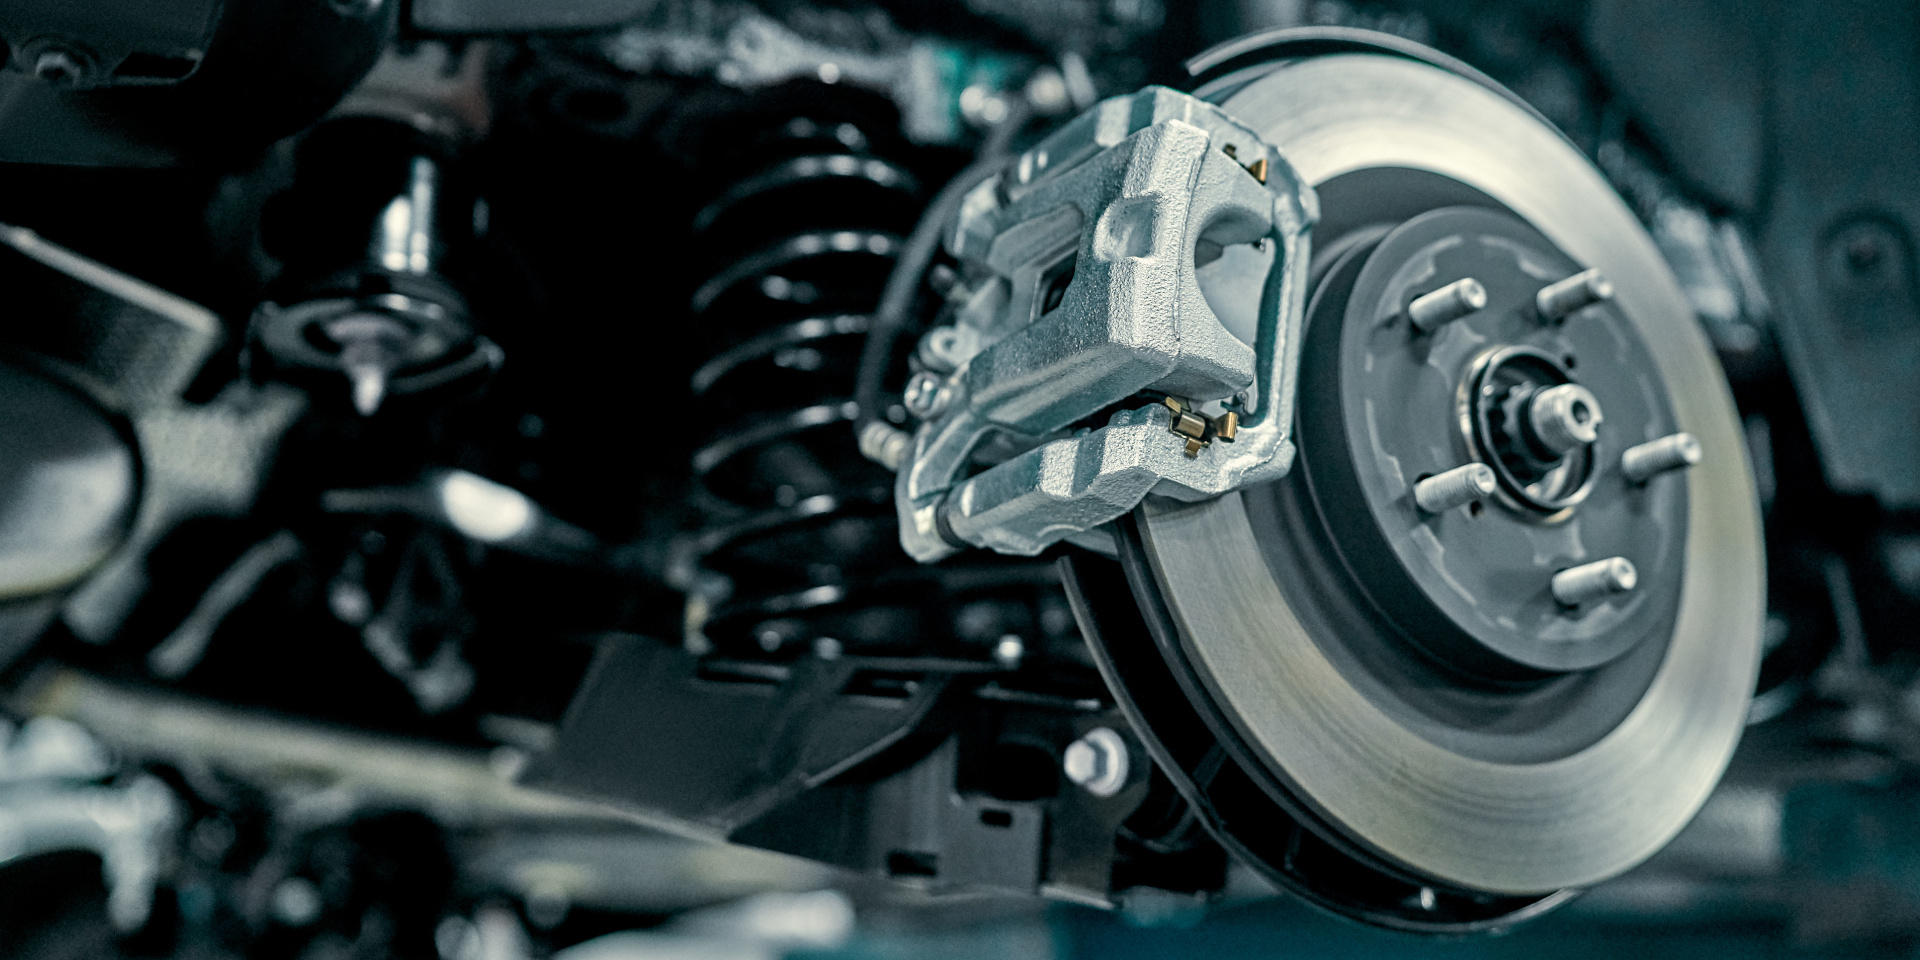 Disc brake of the vehicle for repair,